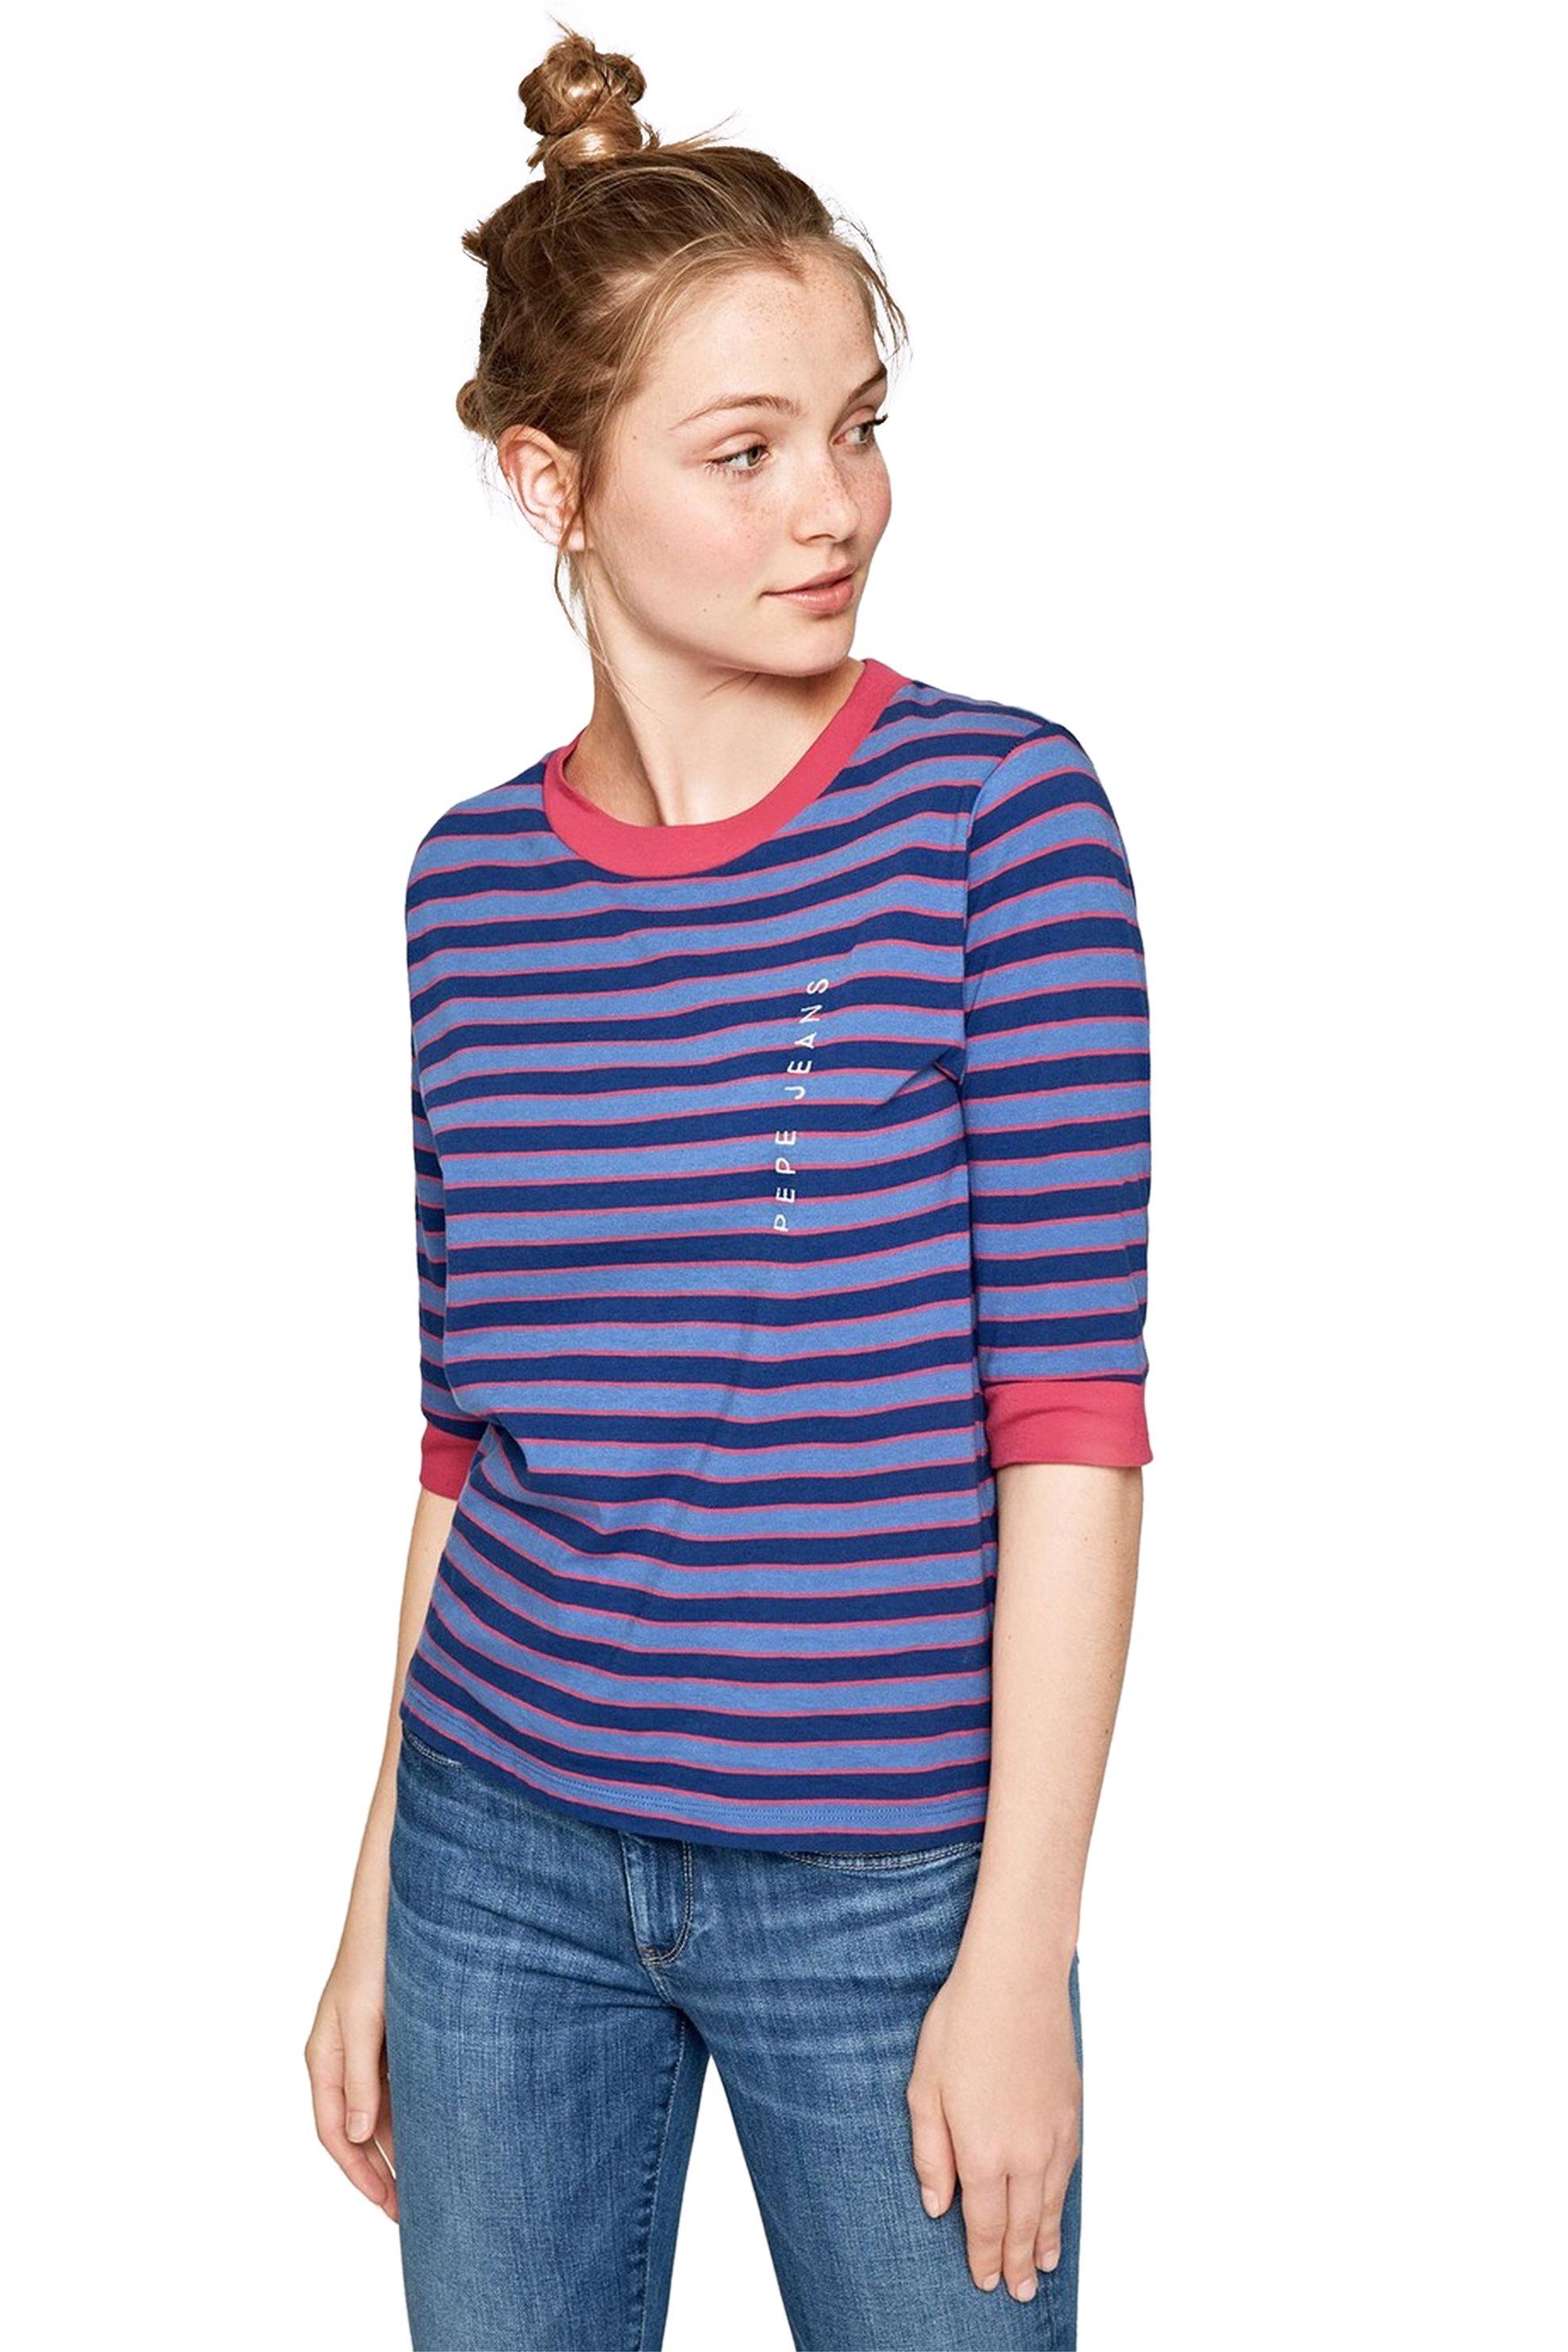 Pepe Jeans γυναικεία μπλούζα ριγέ Florence - PL503961 - Μπλε γυναικα   ρουχα   tops   μπλούζες   casual